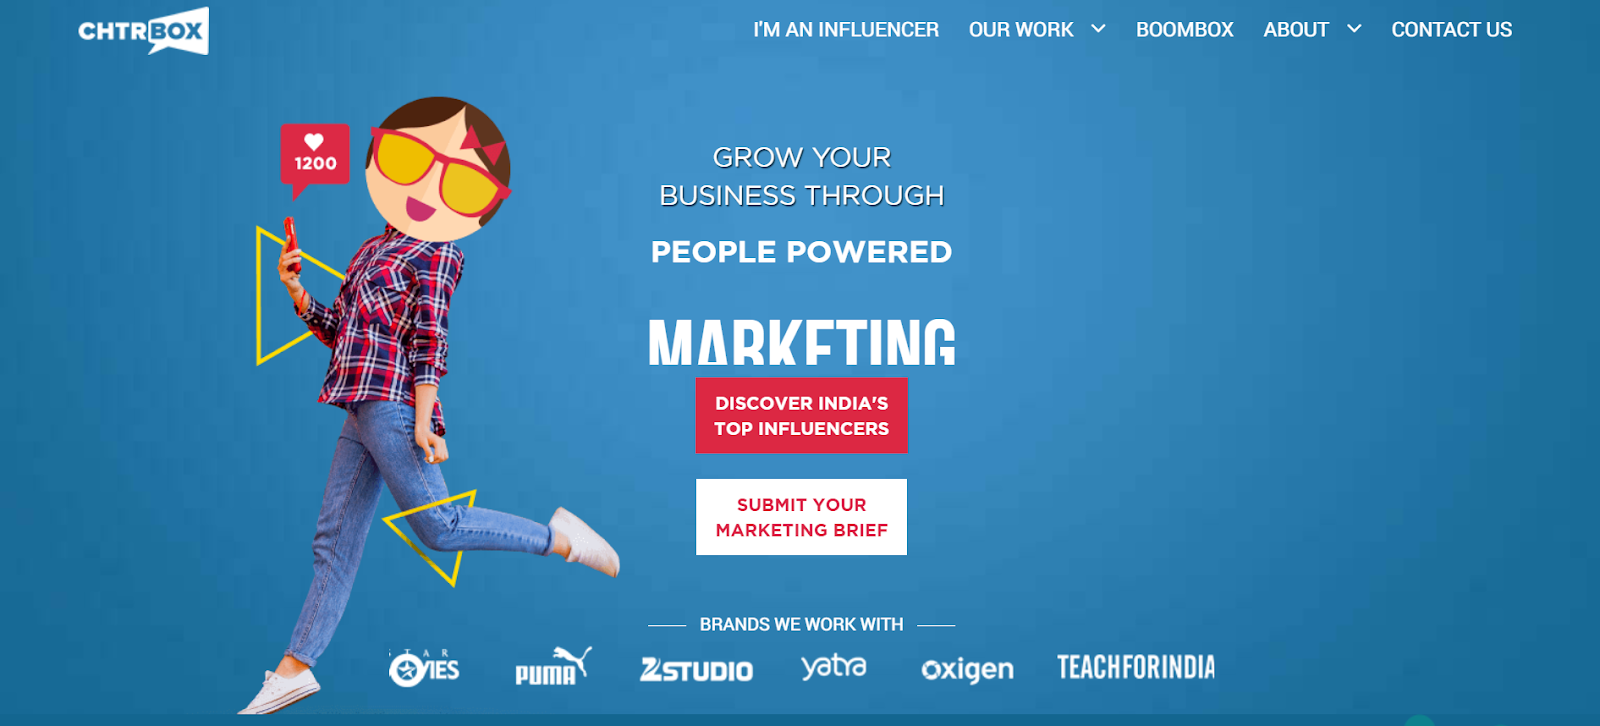 Chtrbox Influencer Marketing Agency